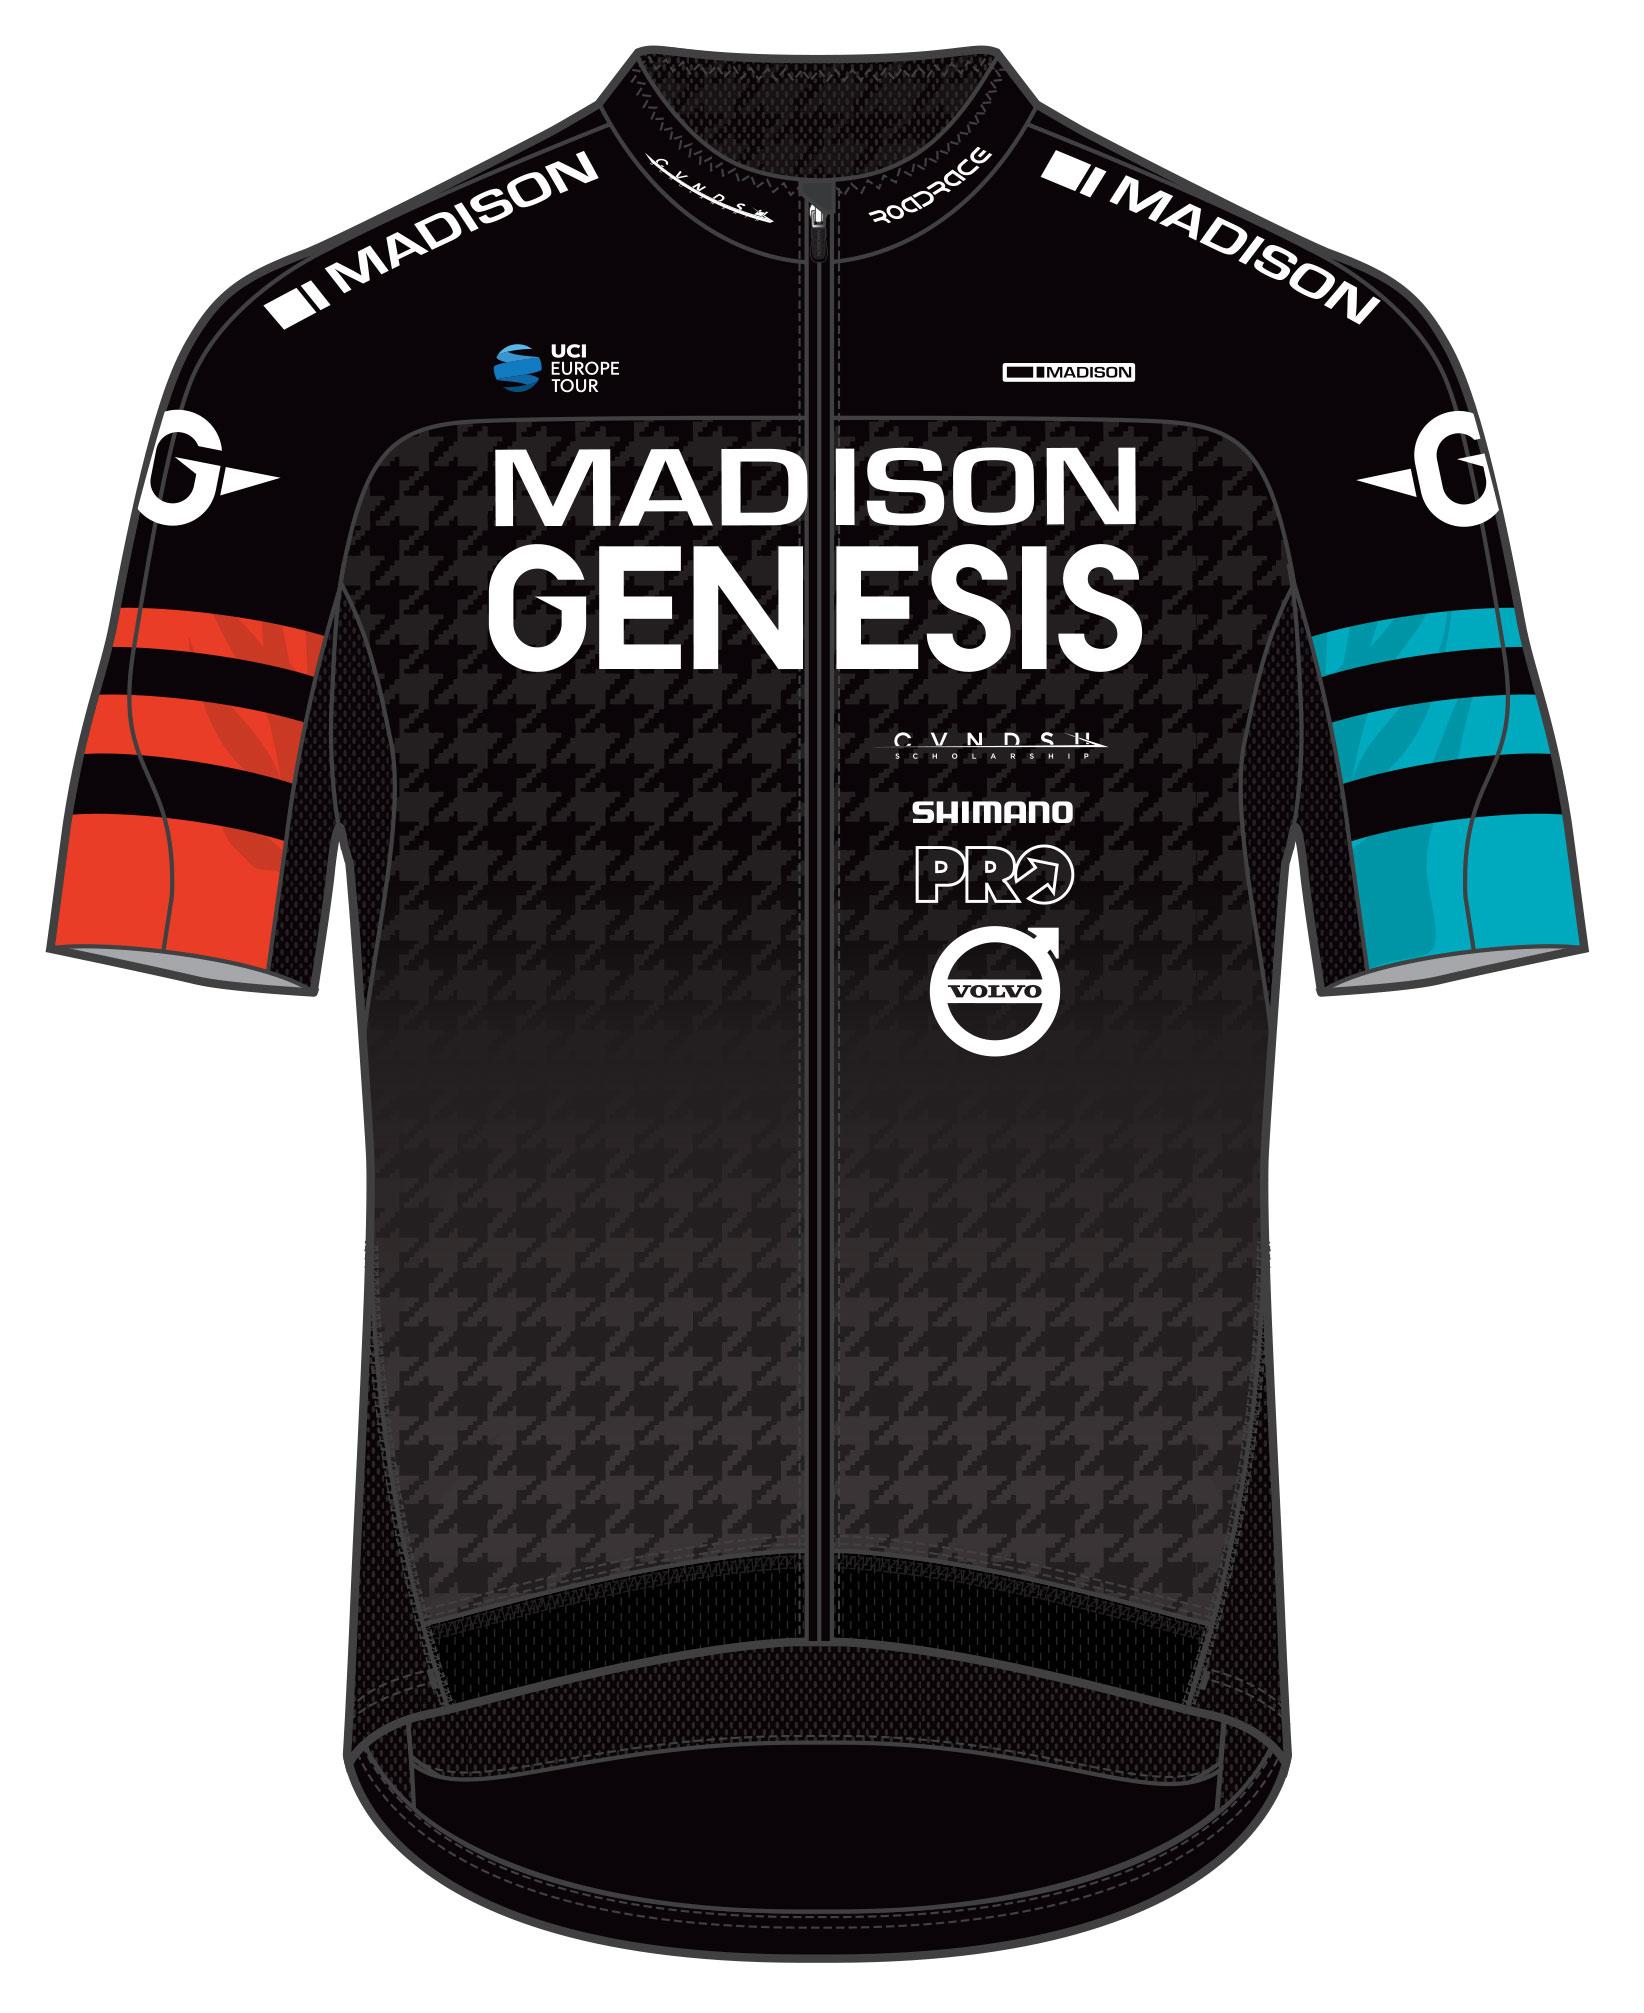 File Madison Genesis Cycling Team jersey 2018.jpg - Wikimedia Commons 05c9c3d56